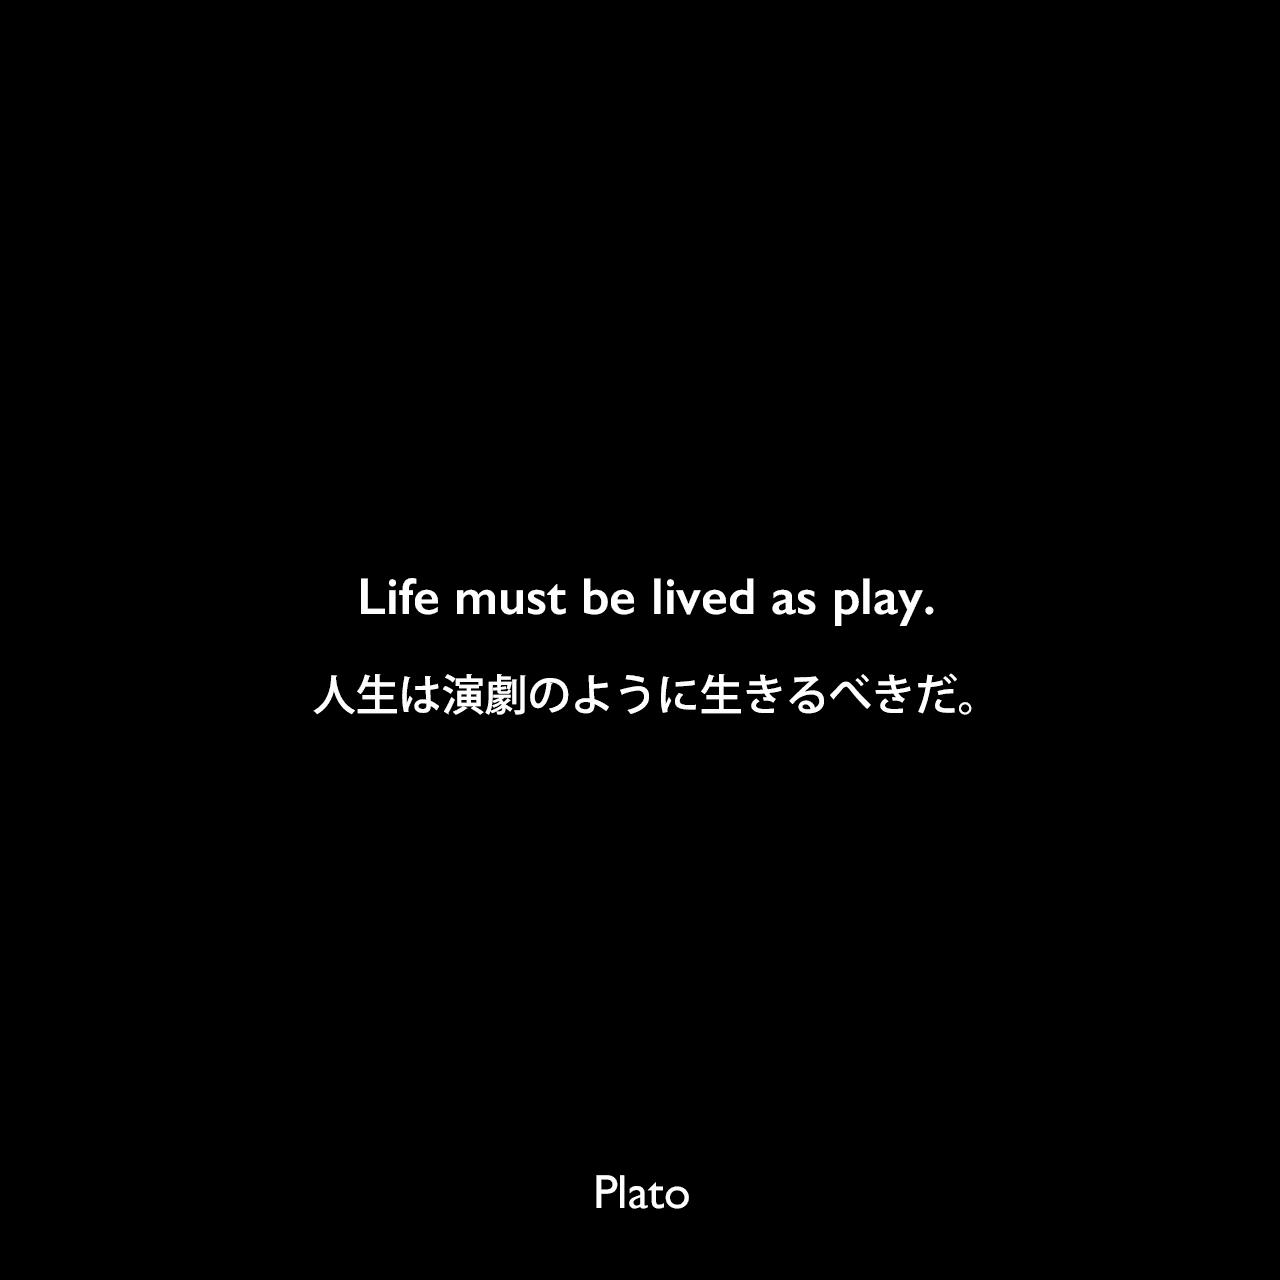 Life must be lived as play.人生は演劇のように生きるべきだ。Plato